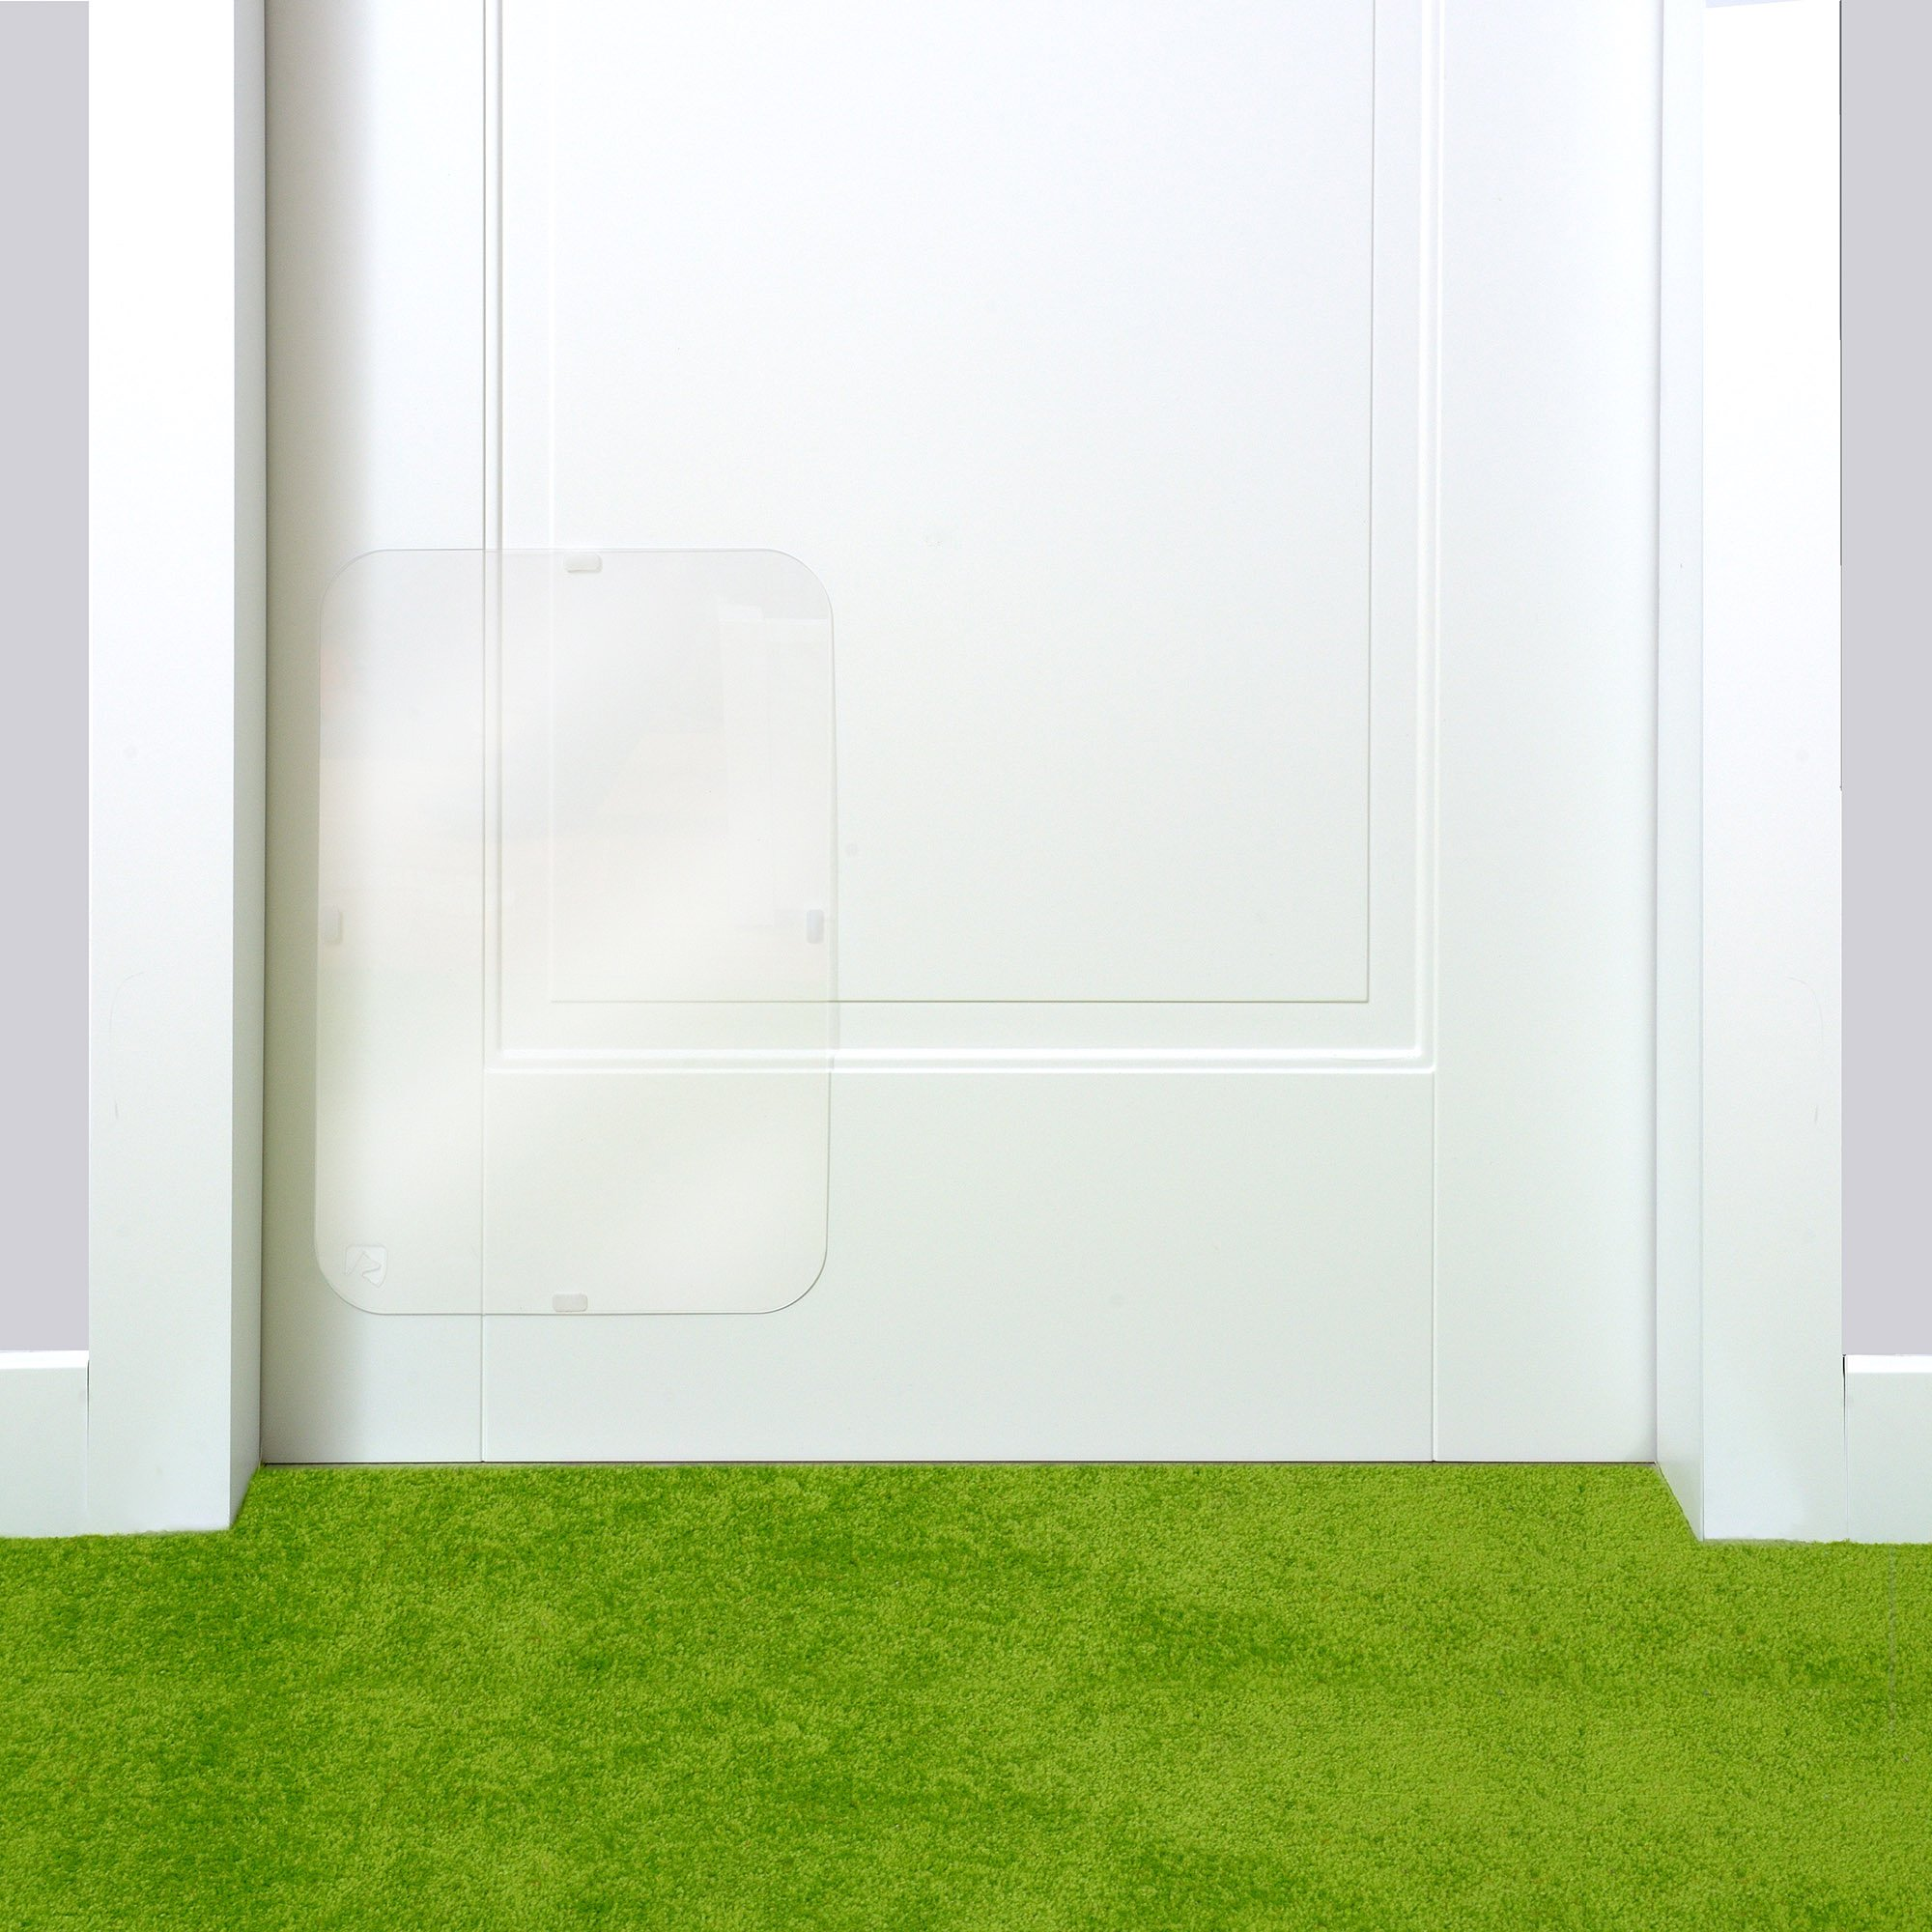 PETFECT Door Scratch Protector Premium Cat Door Cover for Interior & Exterior Use - Clear (20 x 12)